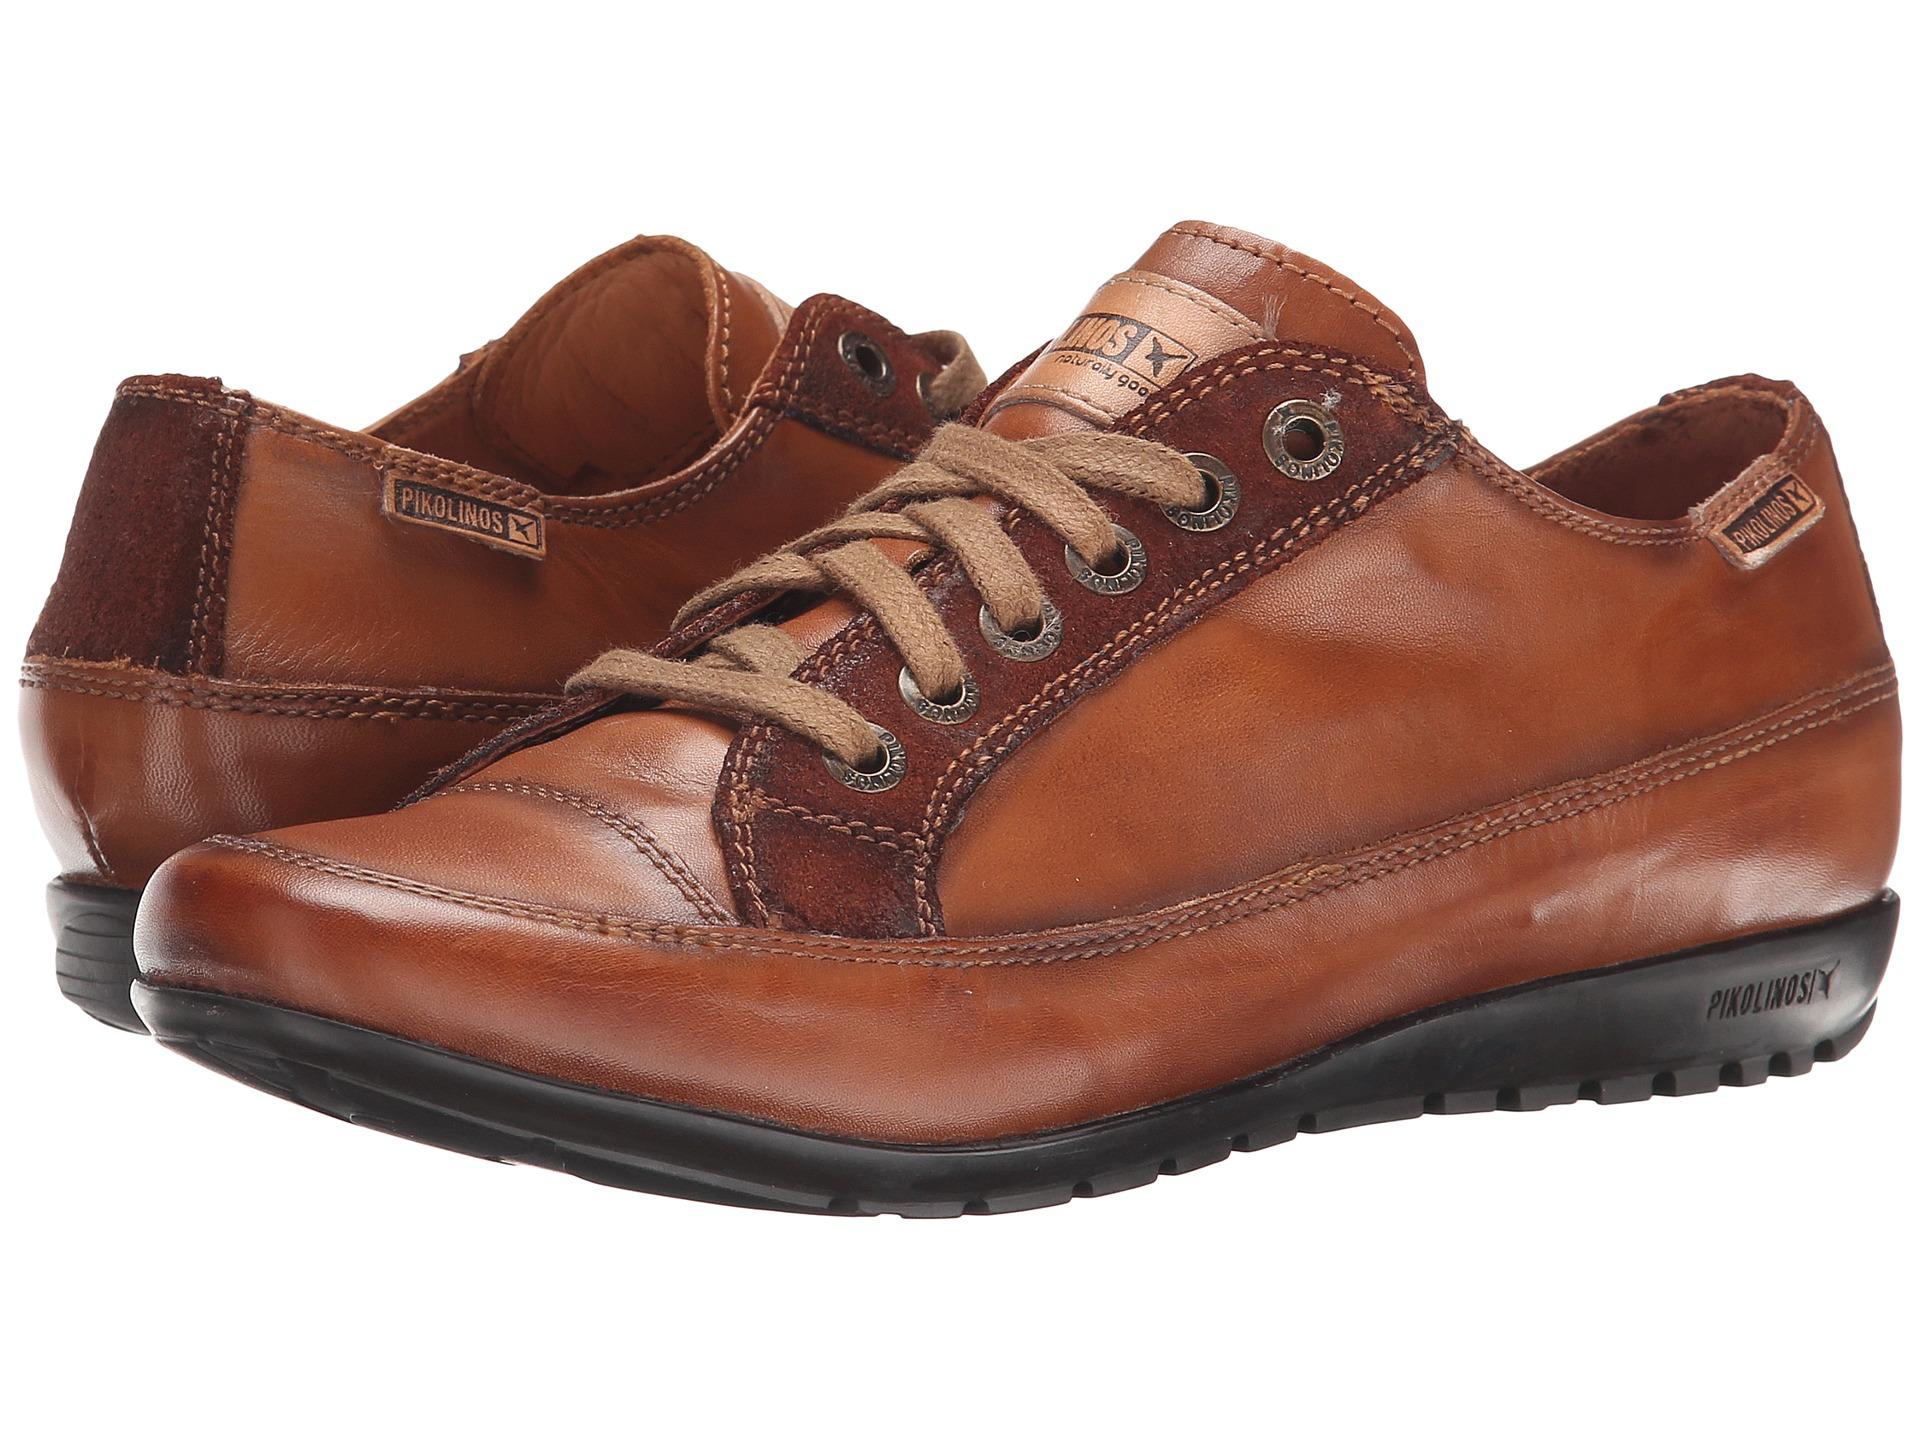 Pikolinos Women S Shoes Lisboa